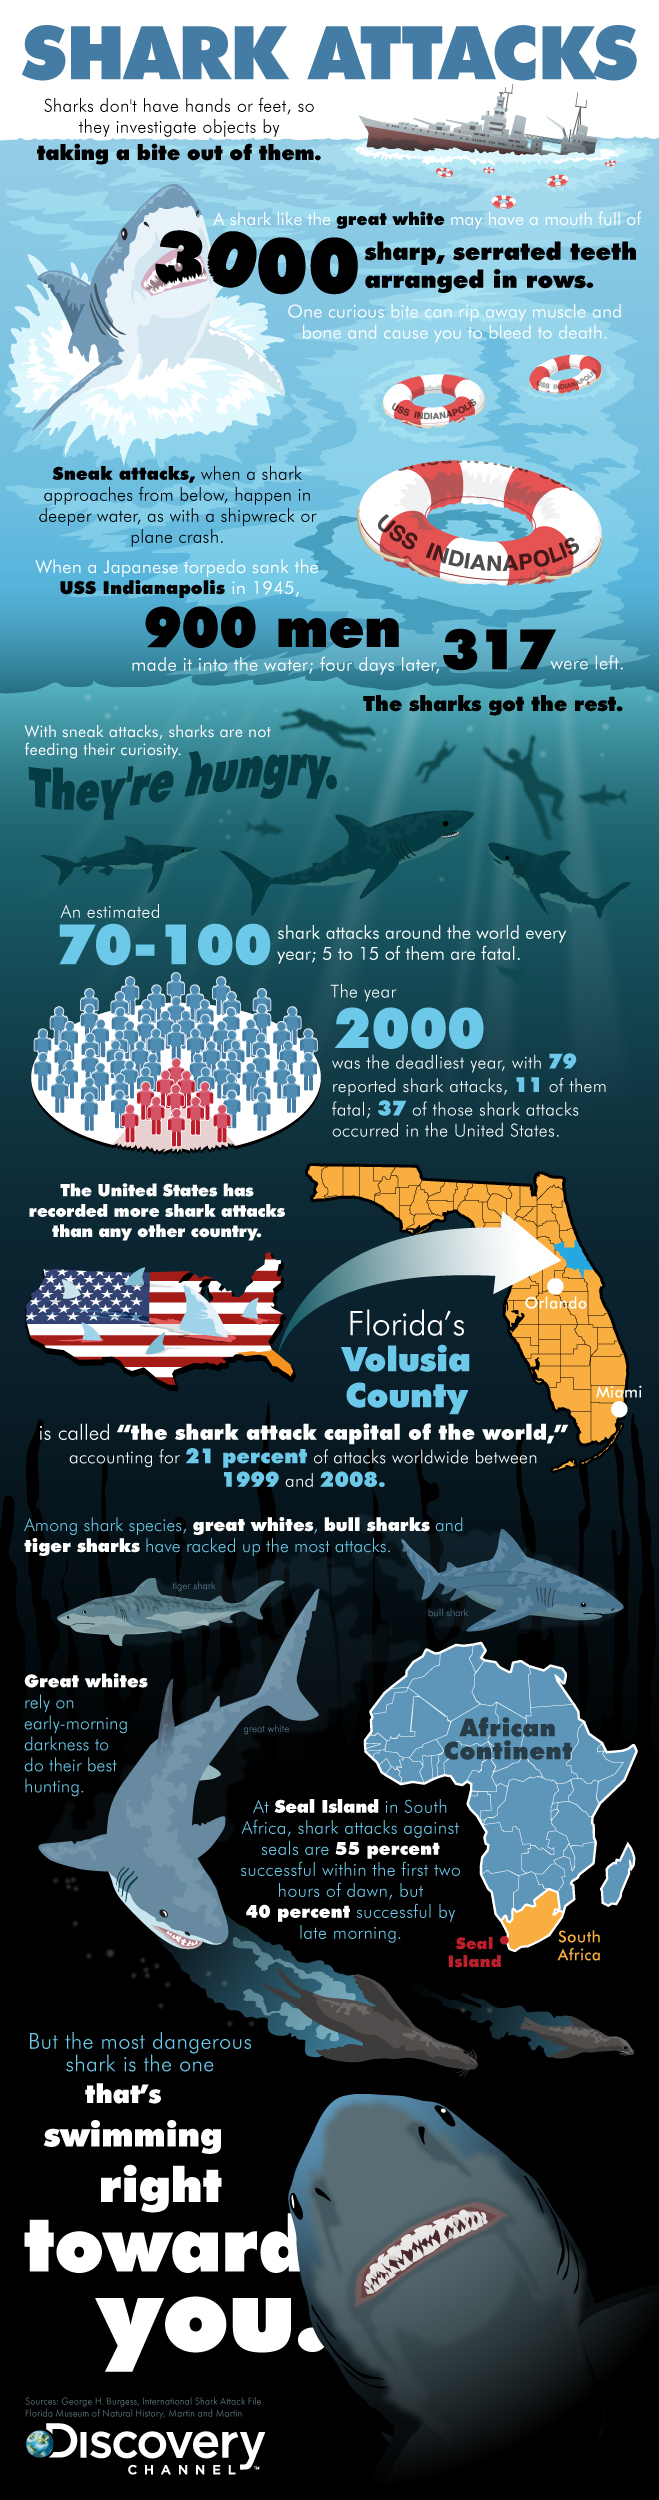 Shark Attack Facts